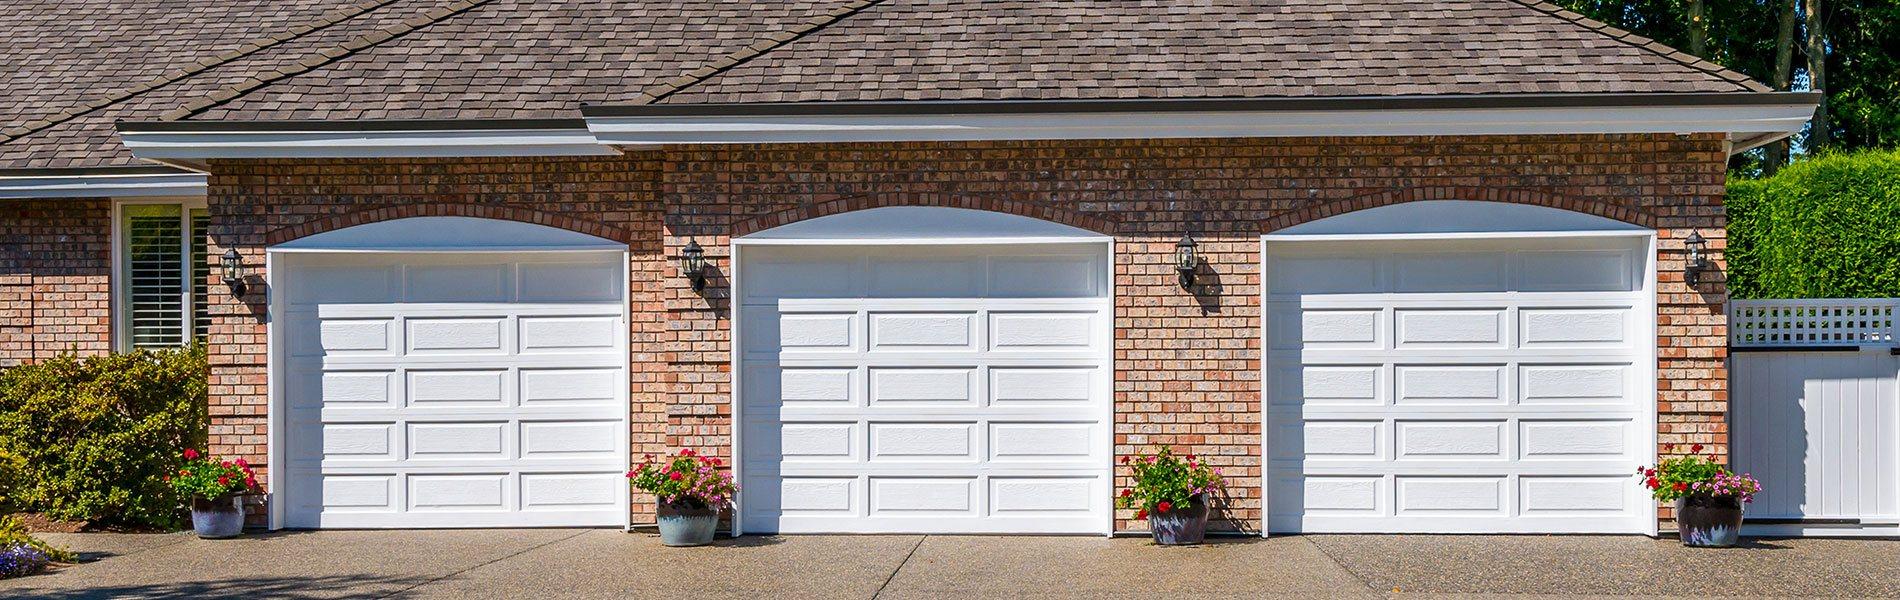 Beau Galaxy Garage Door Service